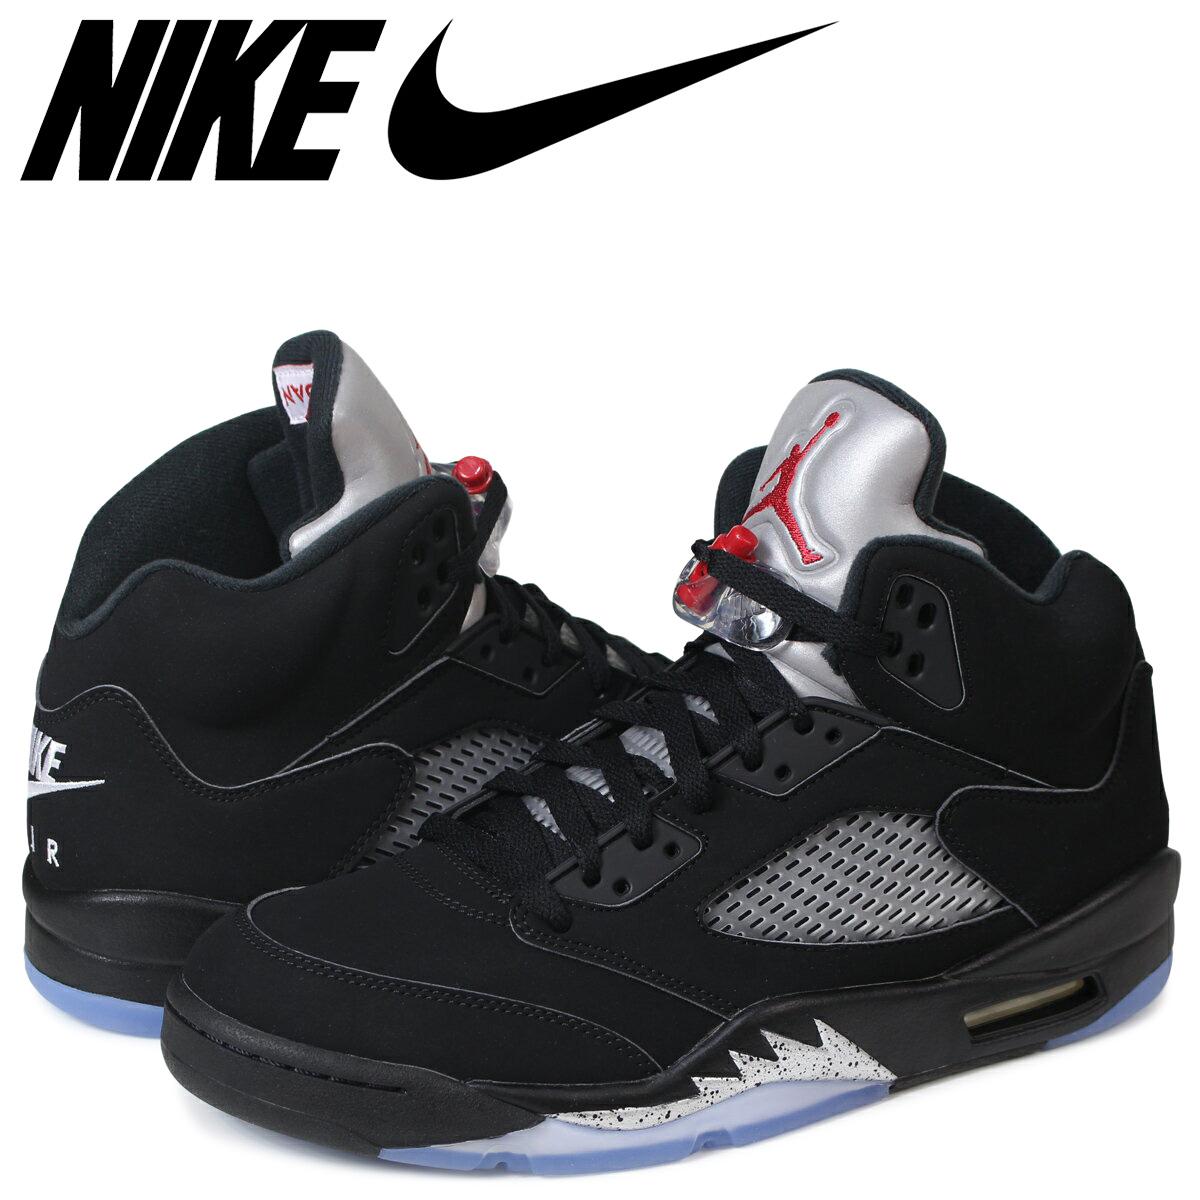 the best attitude 40c07 64a1d NIKE AIR JORDAN 5 RETRO OG Nike Air Jordan 5 nostalgic sneakers 845,035-003  black  185